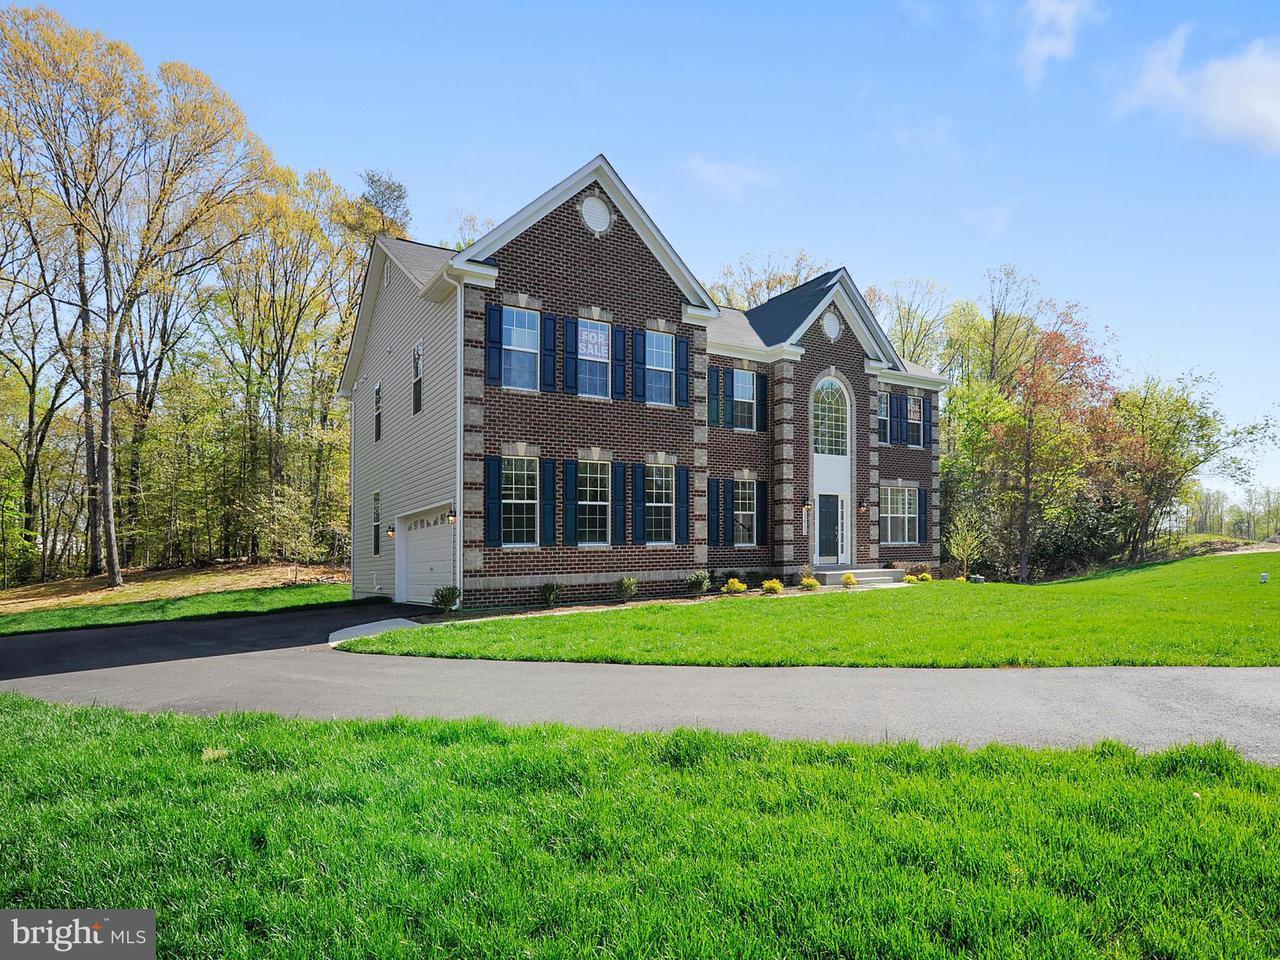 Additional photo for property listing at 15600 TAYLERTON Lane 15600 TAYLERTON Lane Brandywine, Мэриленд 20613 Соединенные Штаты